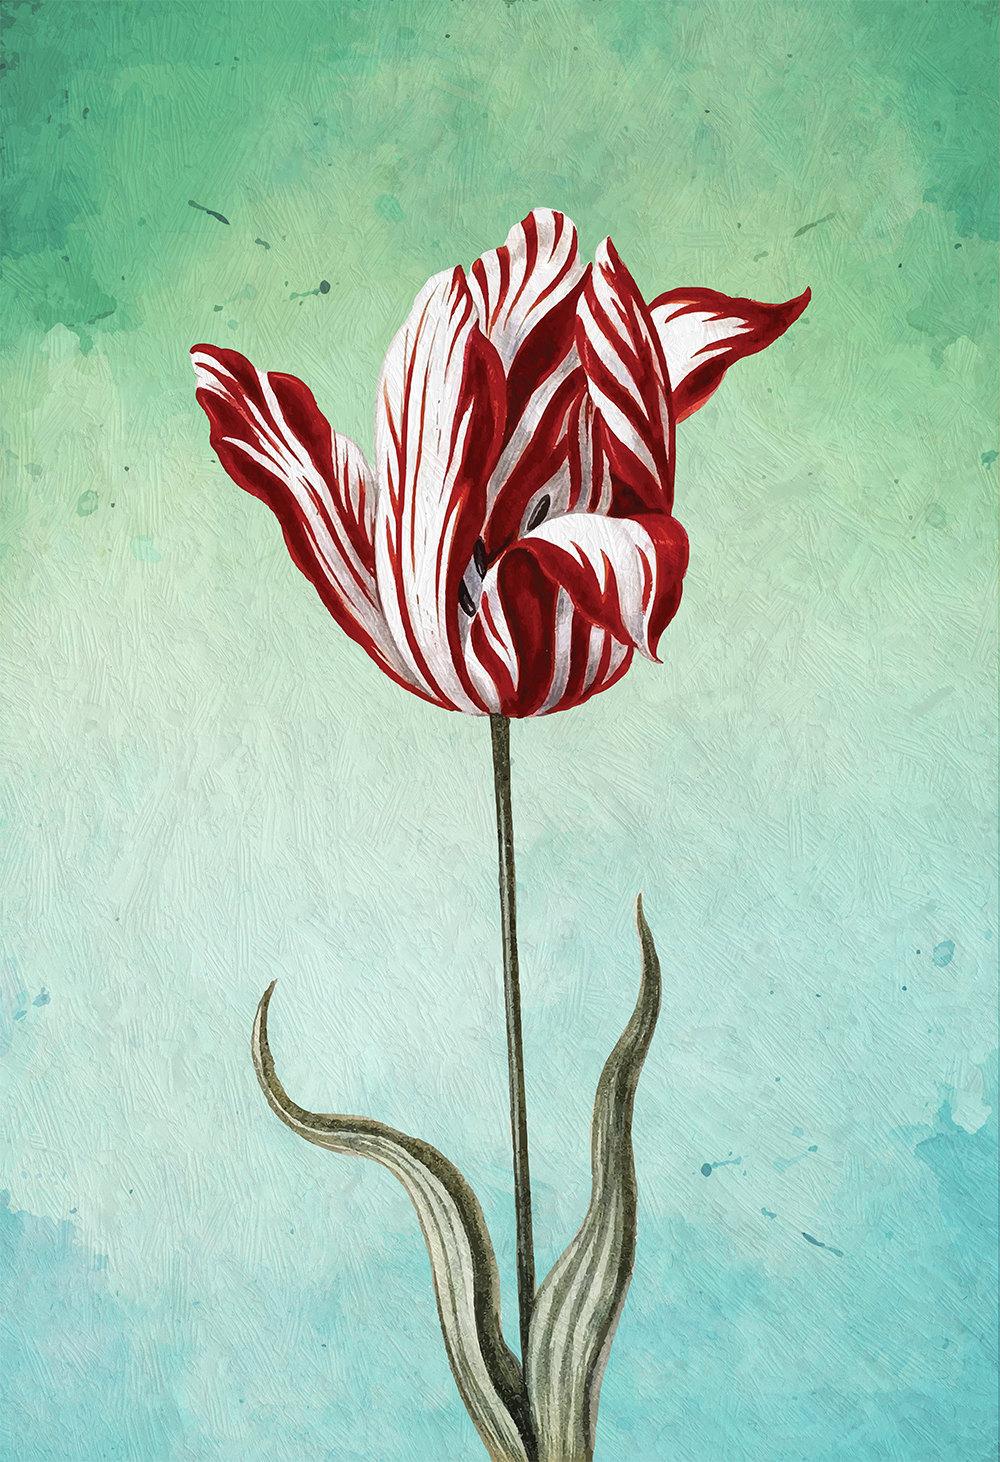 Tulip Print Tulip Art Botanical Print Flower Tulips Decor Floral